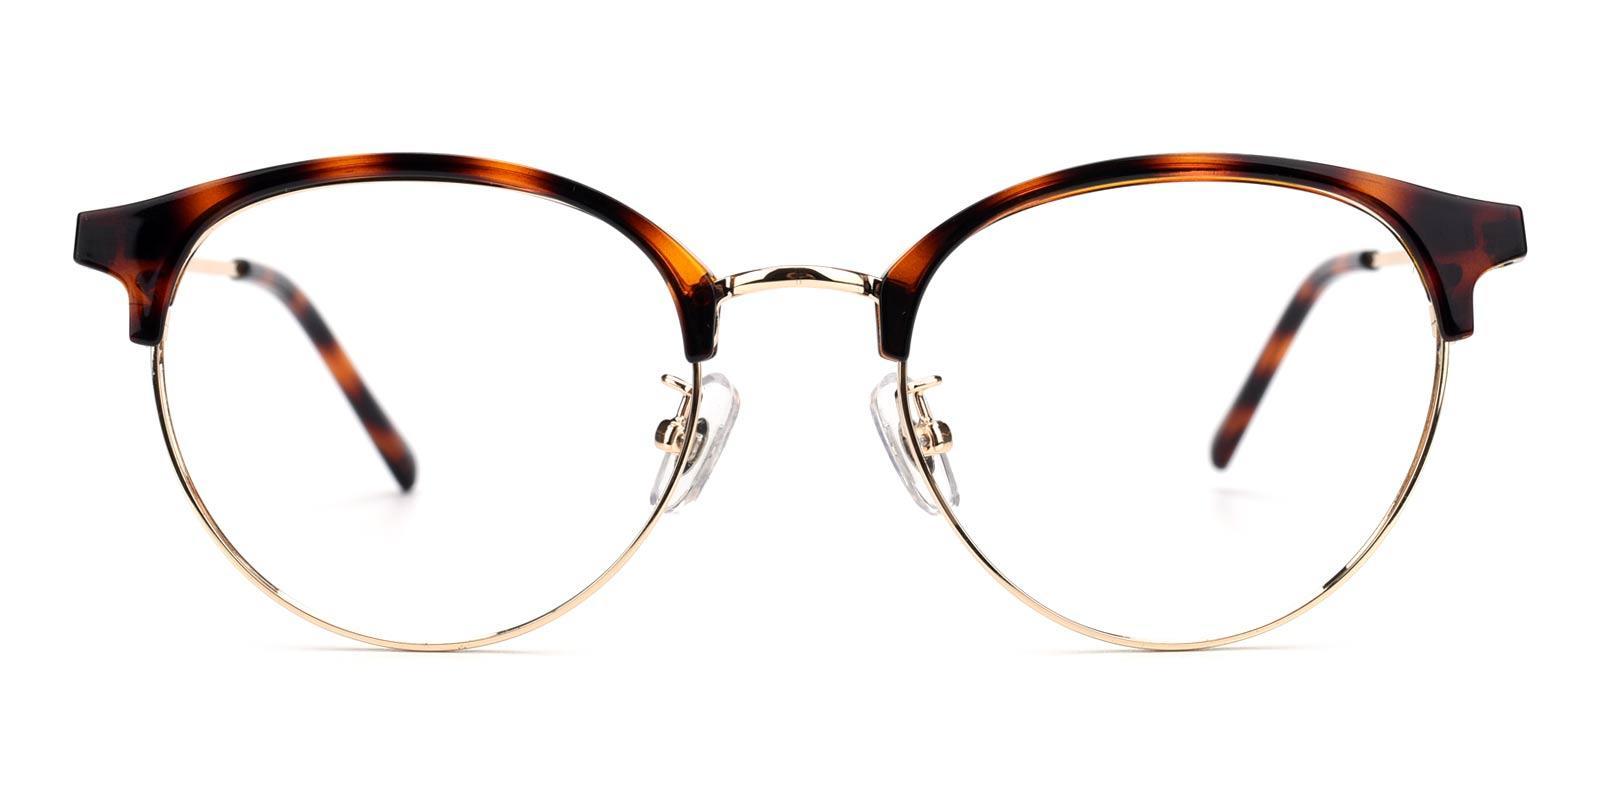 Gaze-Tortoise-Browline-Metal-Eyeglasses-detail